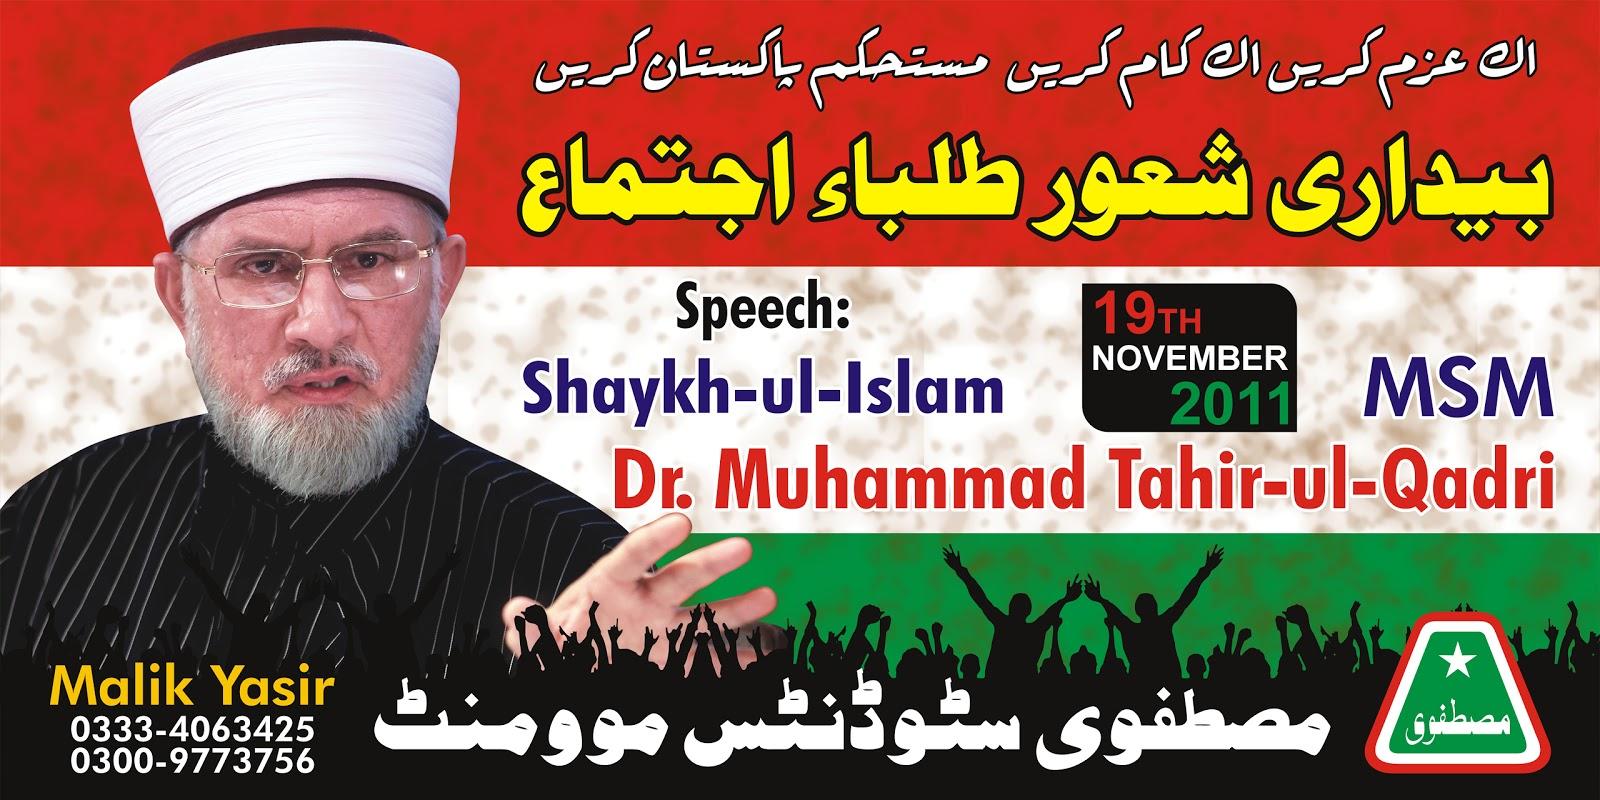 Akhtar Bedari E Shaoor Talba Ijtama Dr Muhammad Tahir Ul Qadri MSM